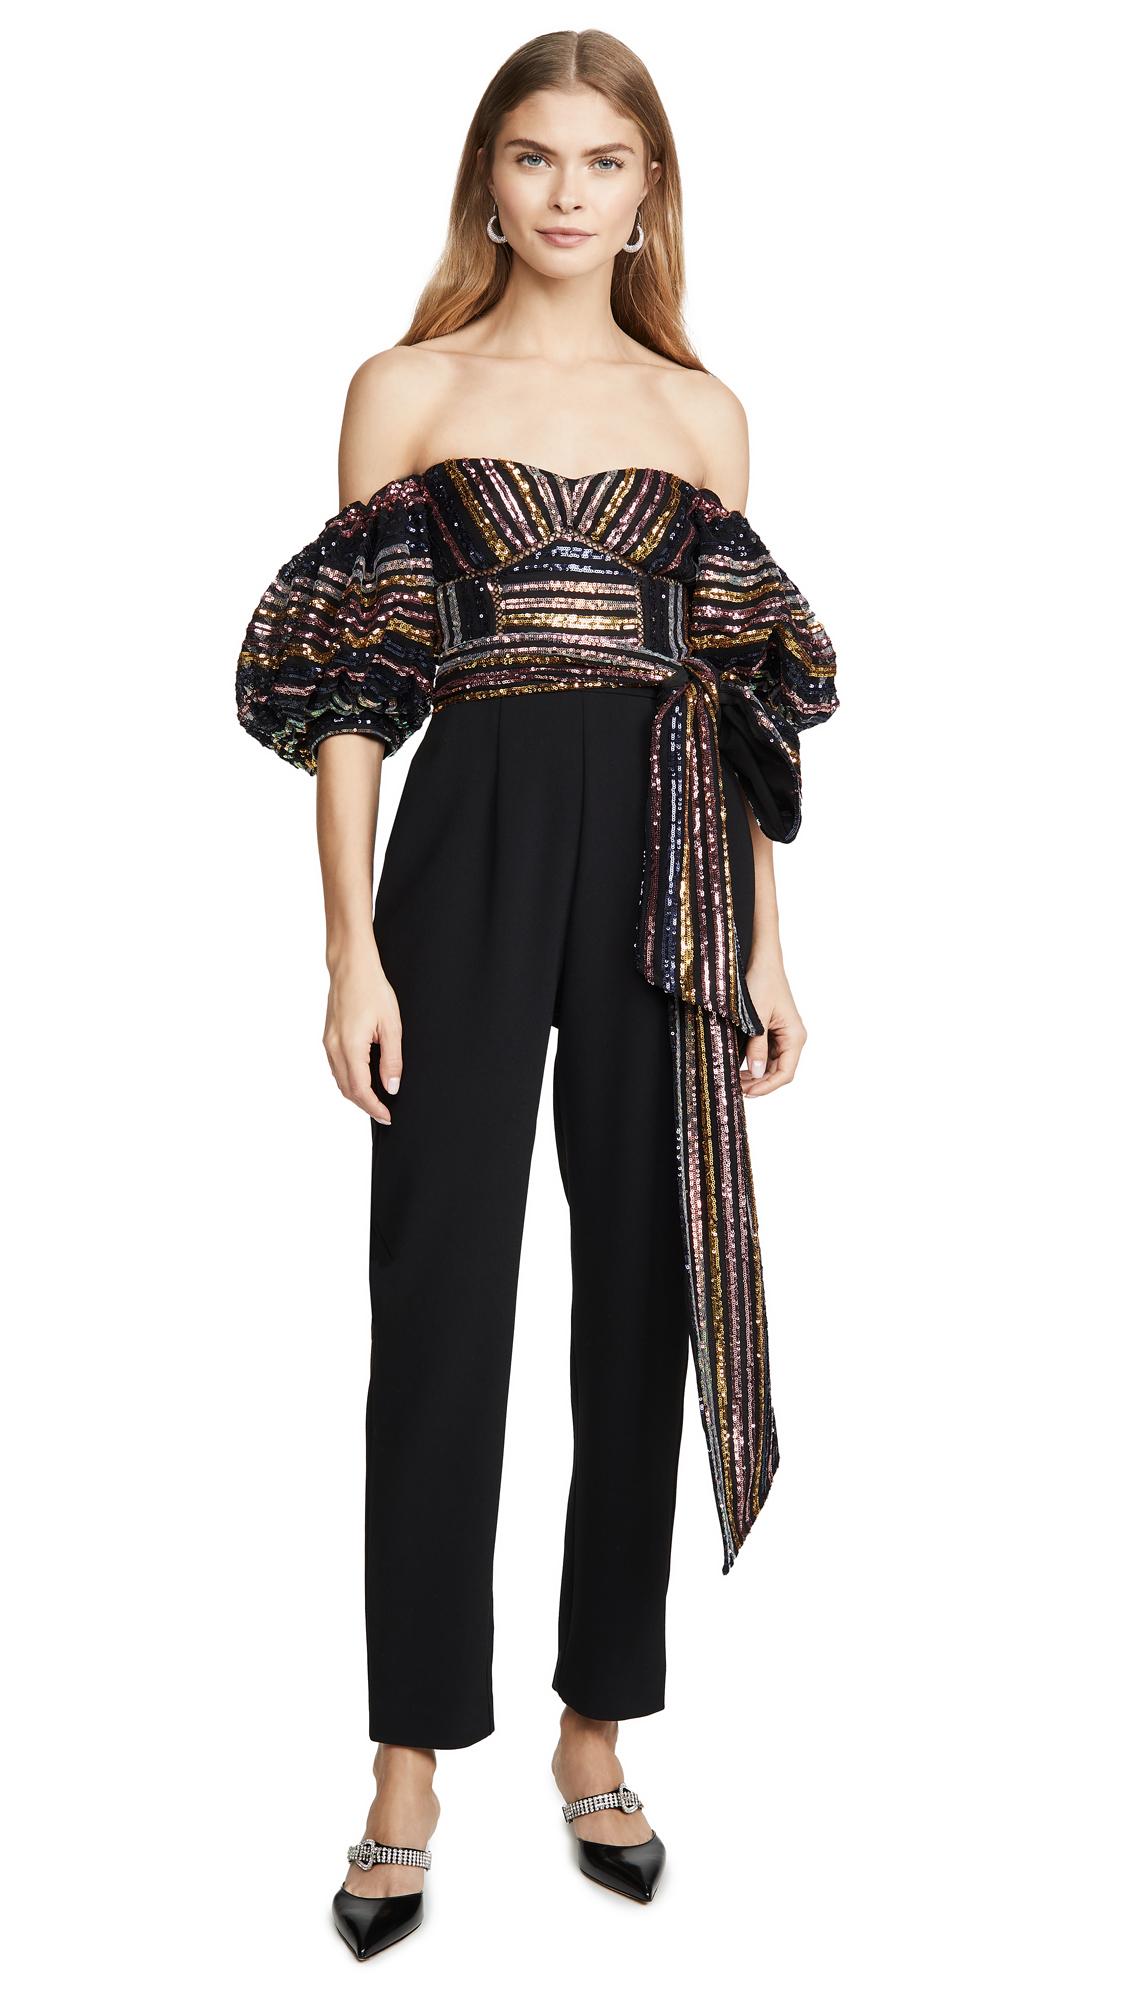 Self Portrait Stripe Sequin Jumpsuit - Multi/Black